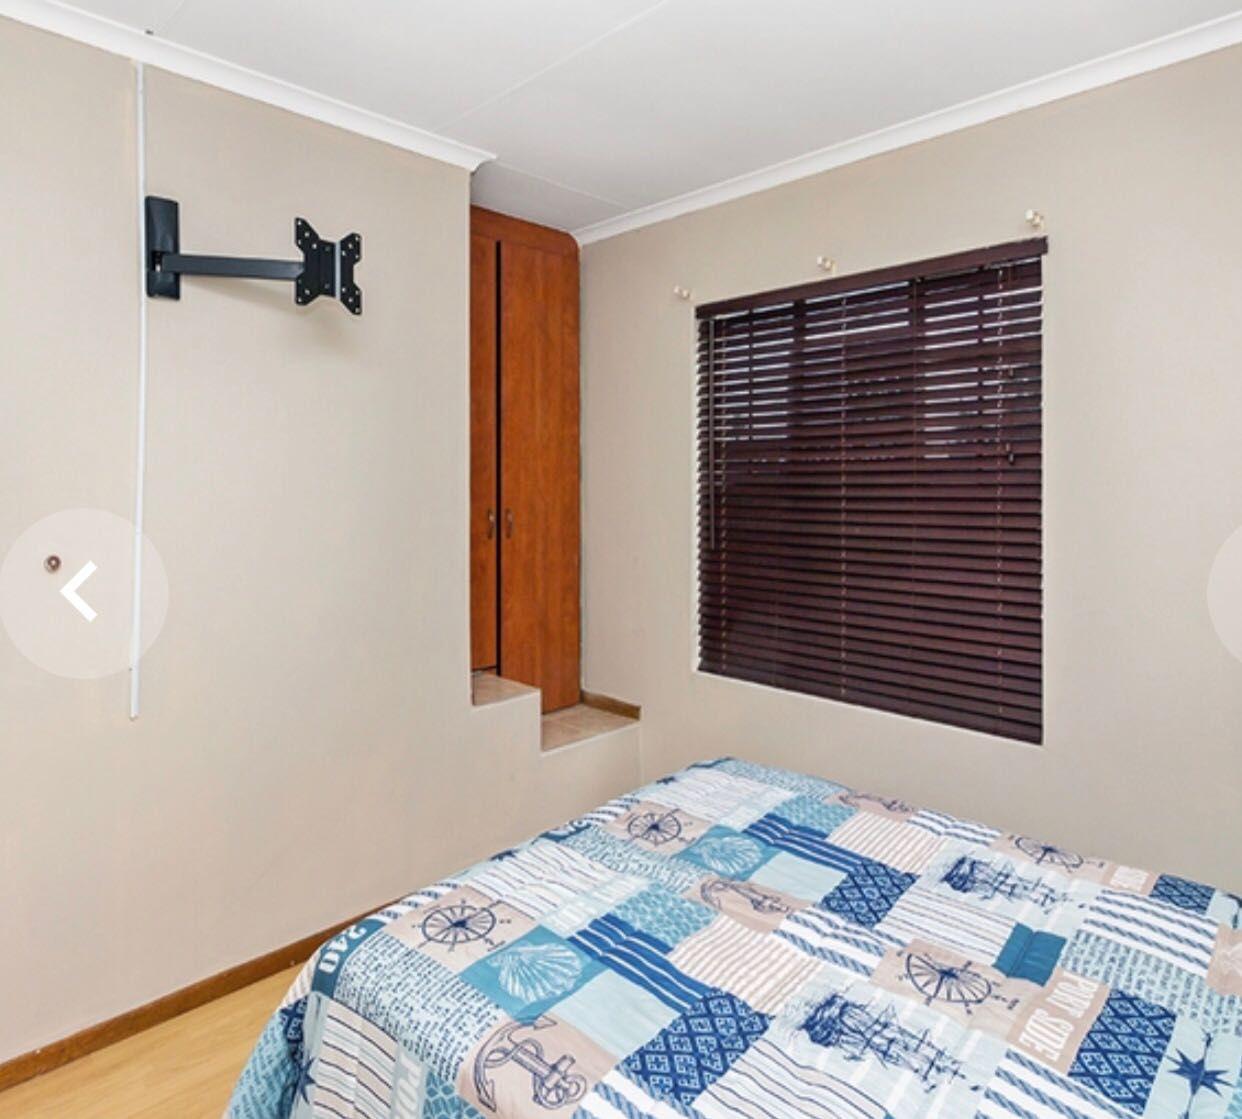 Brooklands Lifestyle Estate property for sale. Ref No: 13623361. Picture no 7